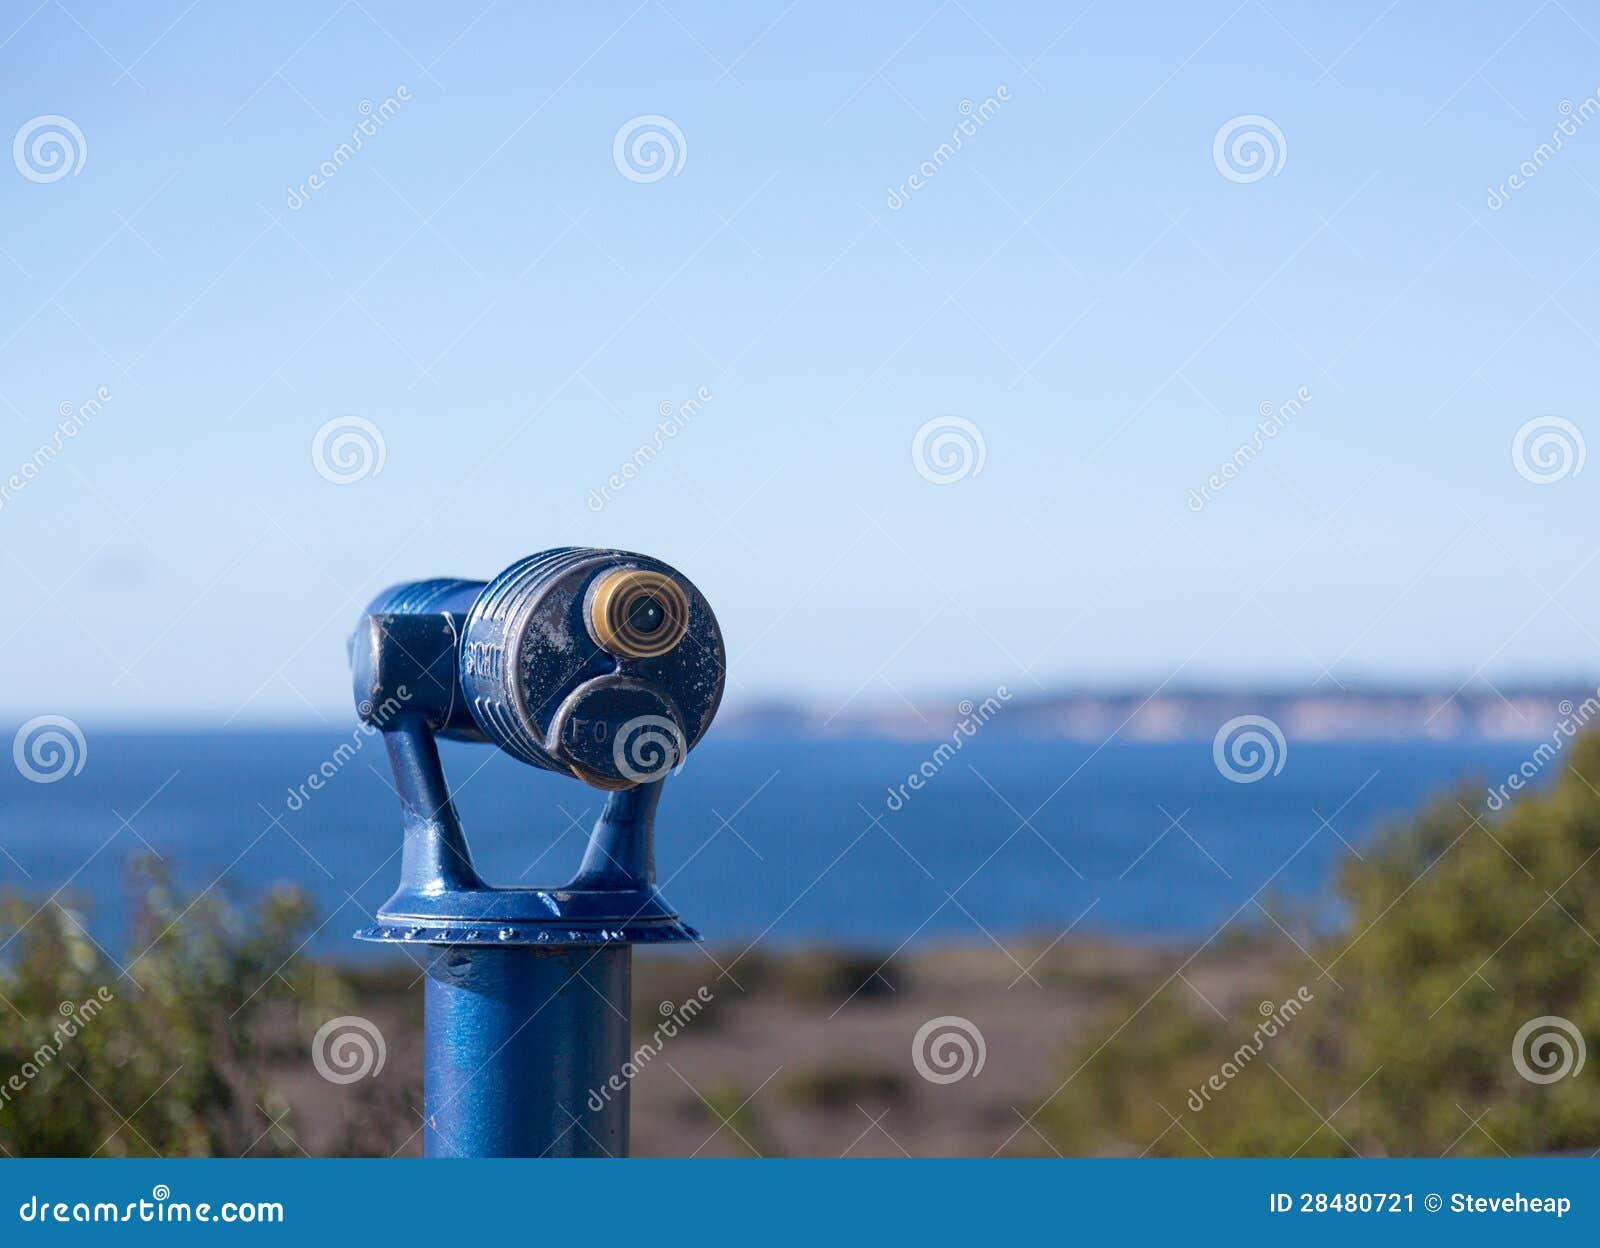 Download Blue Telescope On Coast Of Malibu Stock Image - Image of operated, outdoors: 28480721